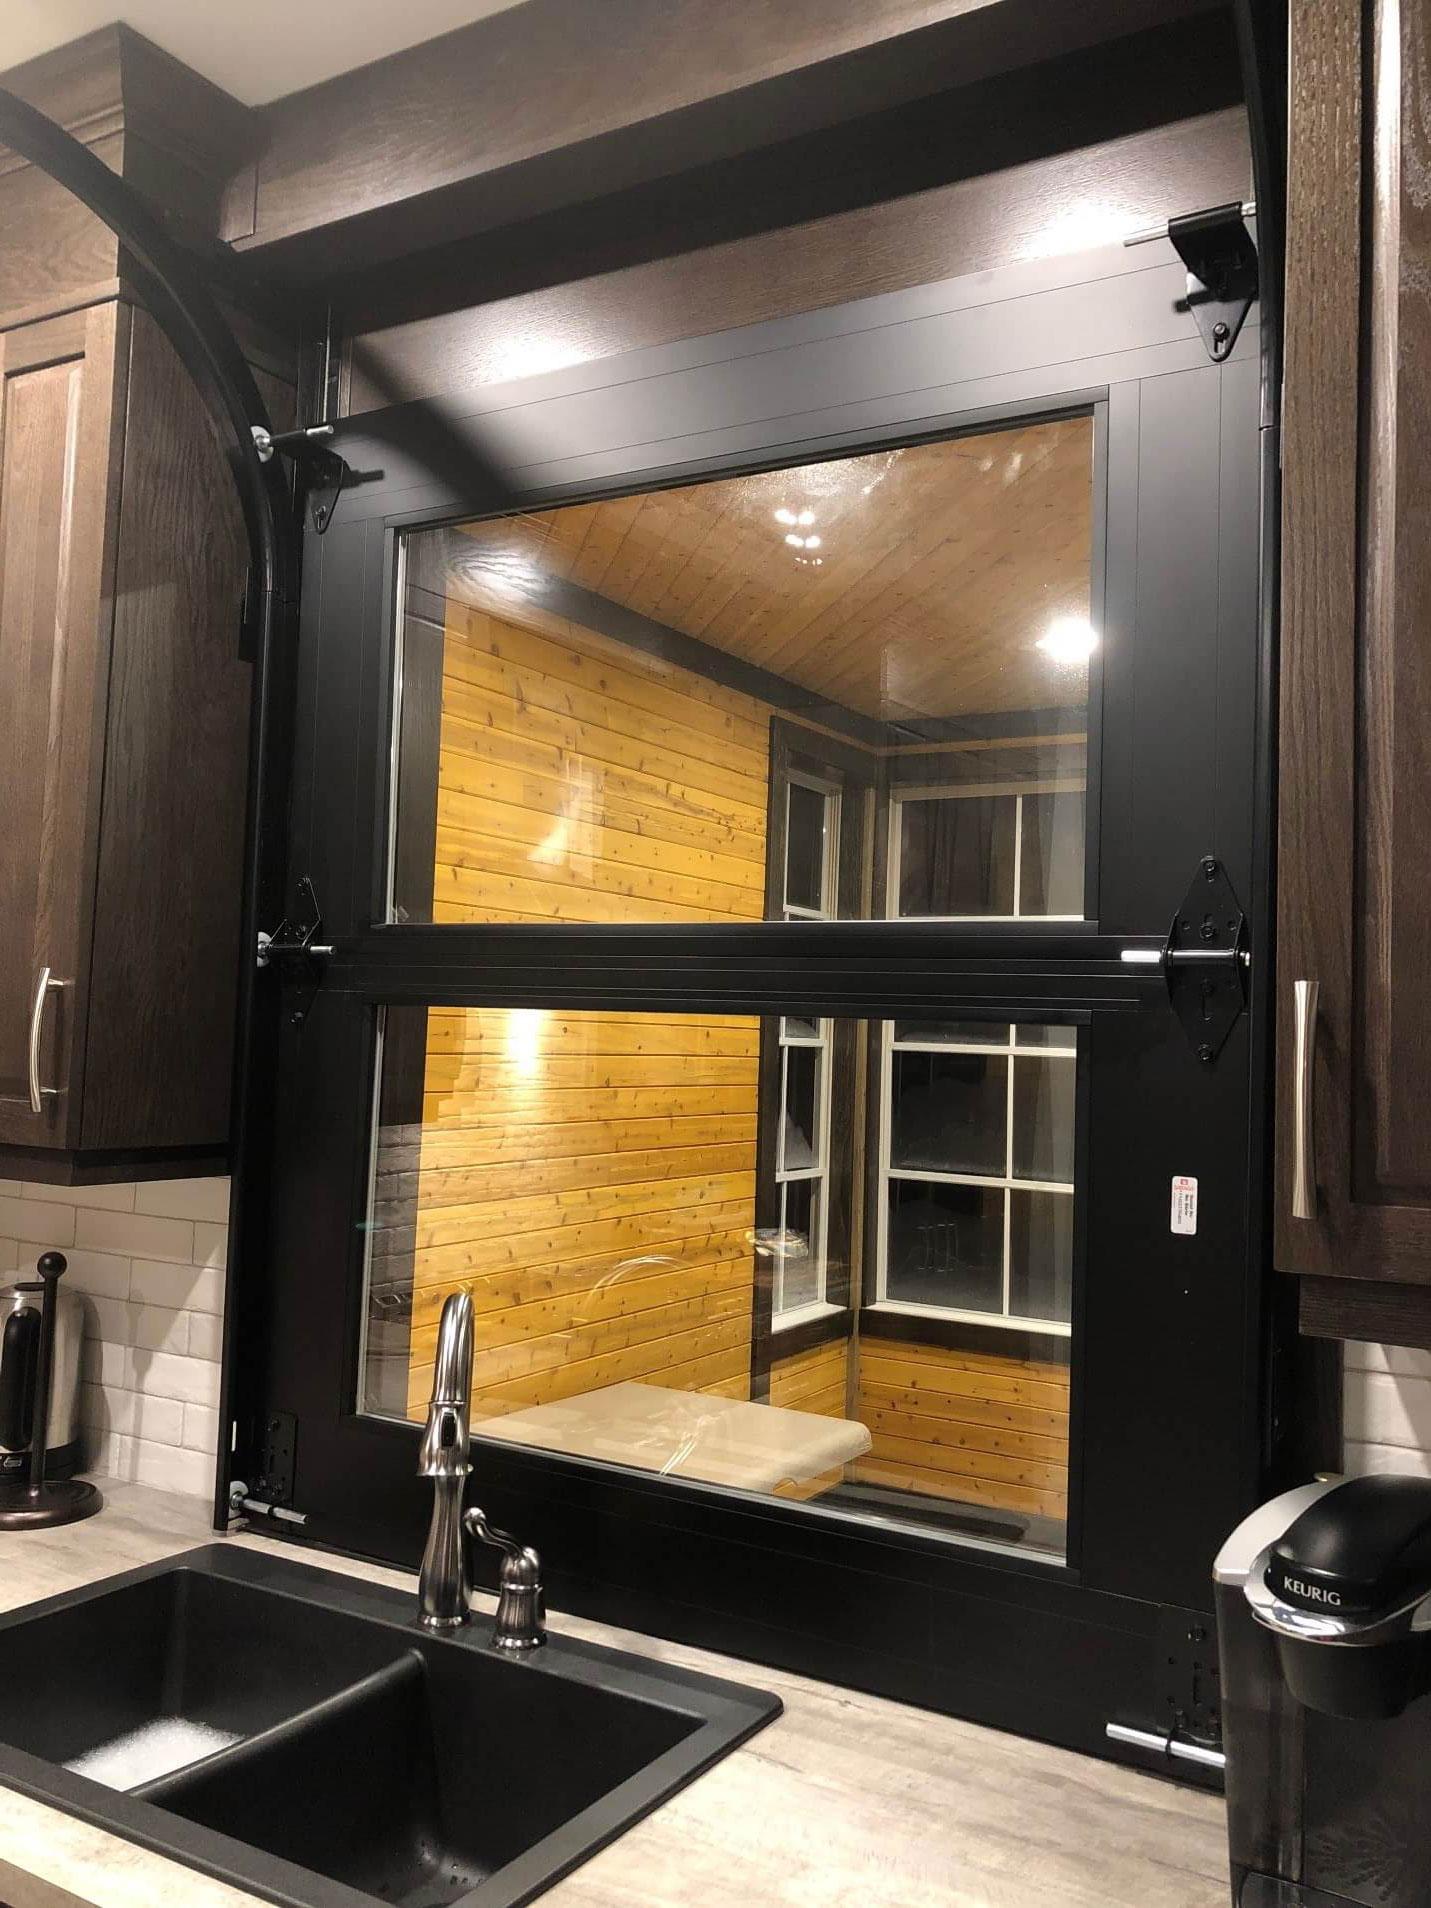 The California garage door over a kitchen sink. Inside of the door from the kitchen